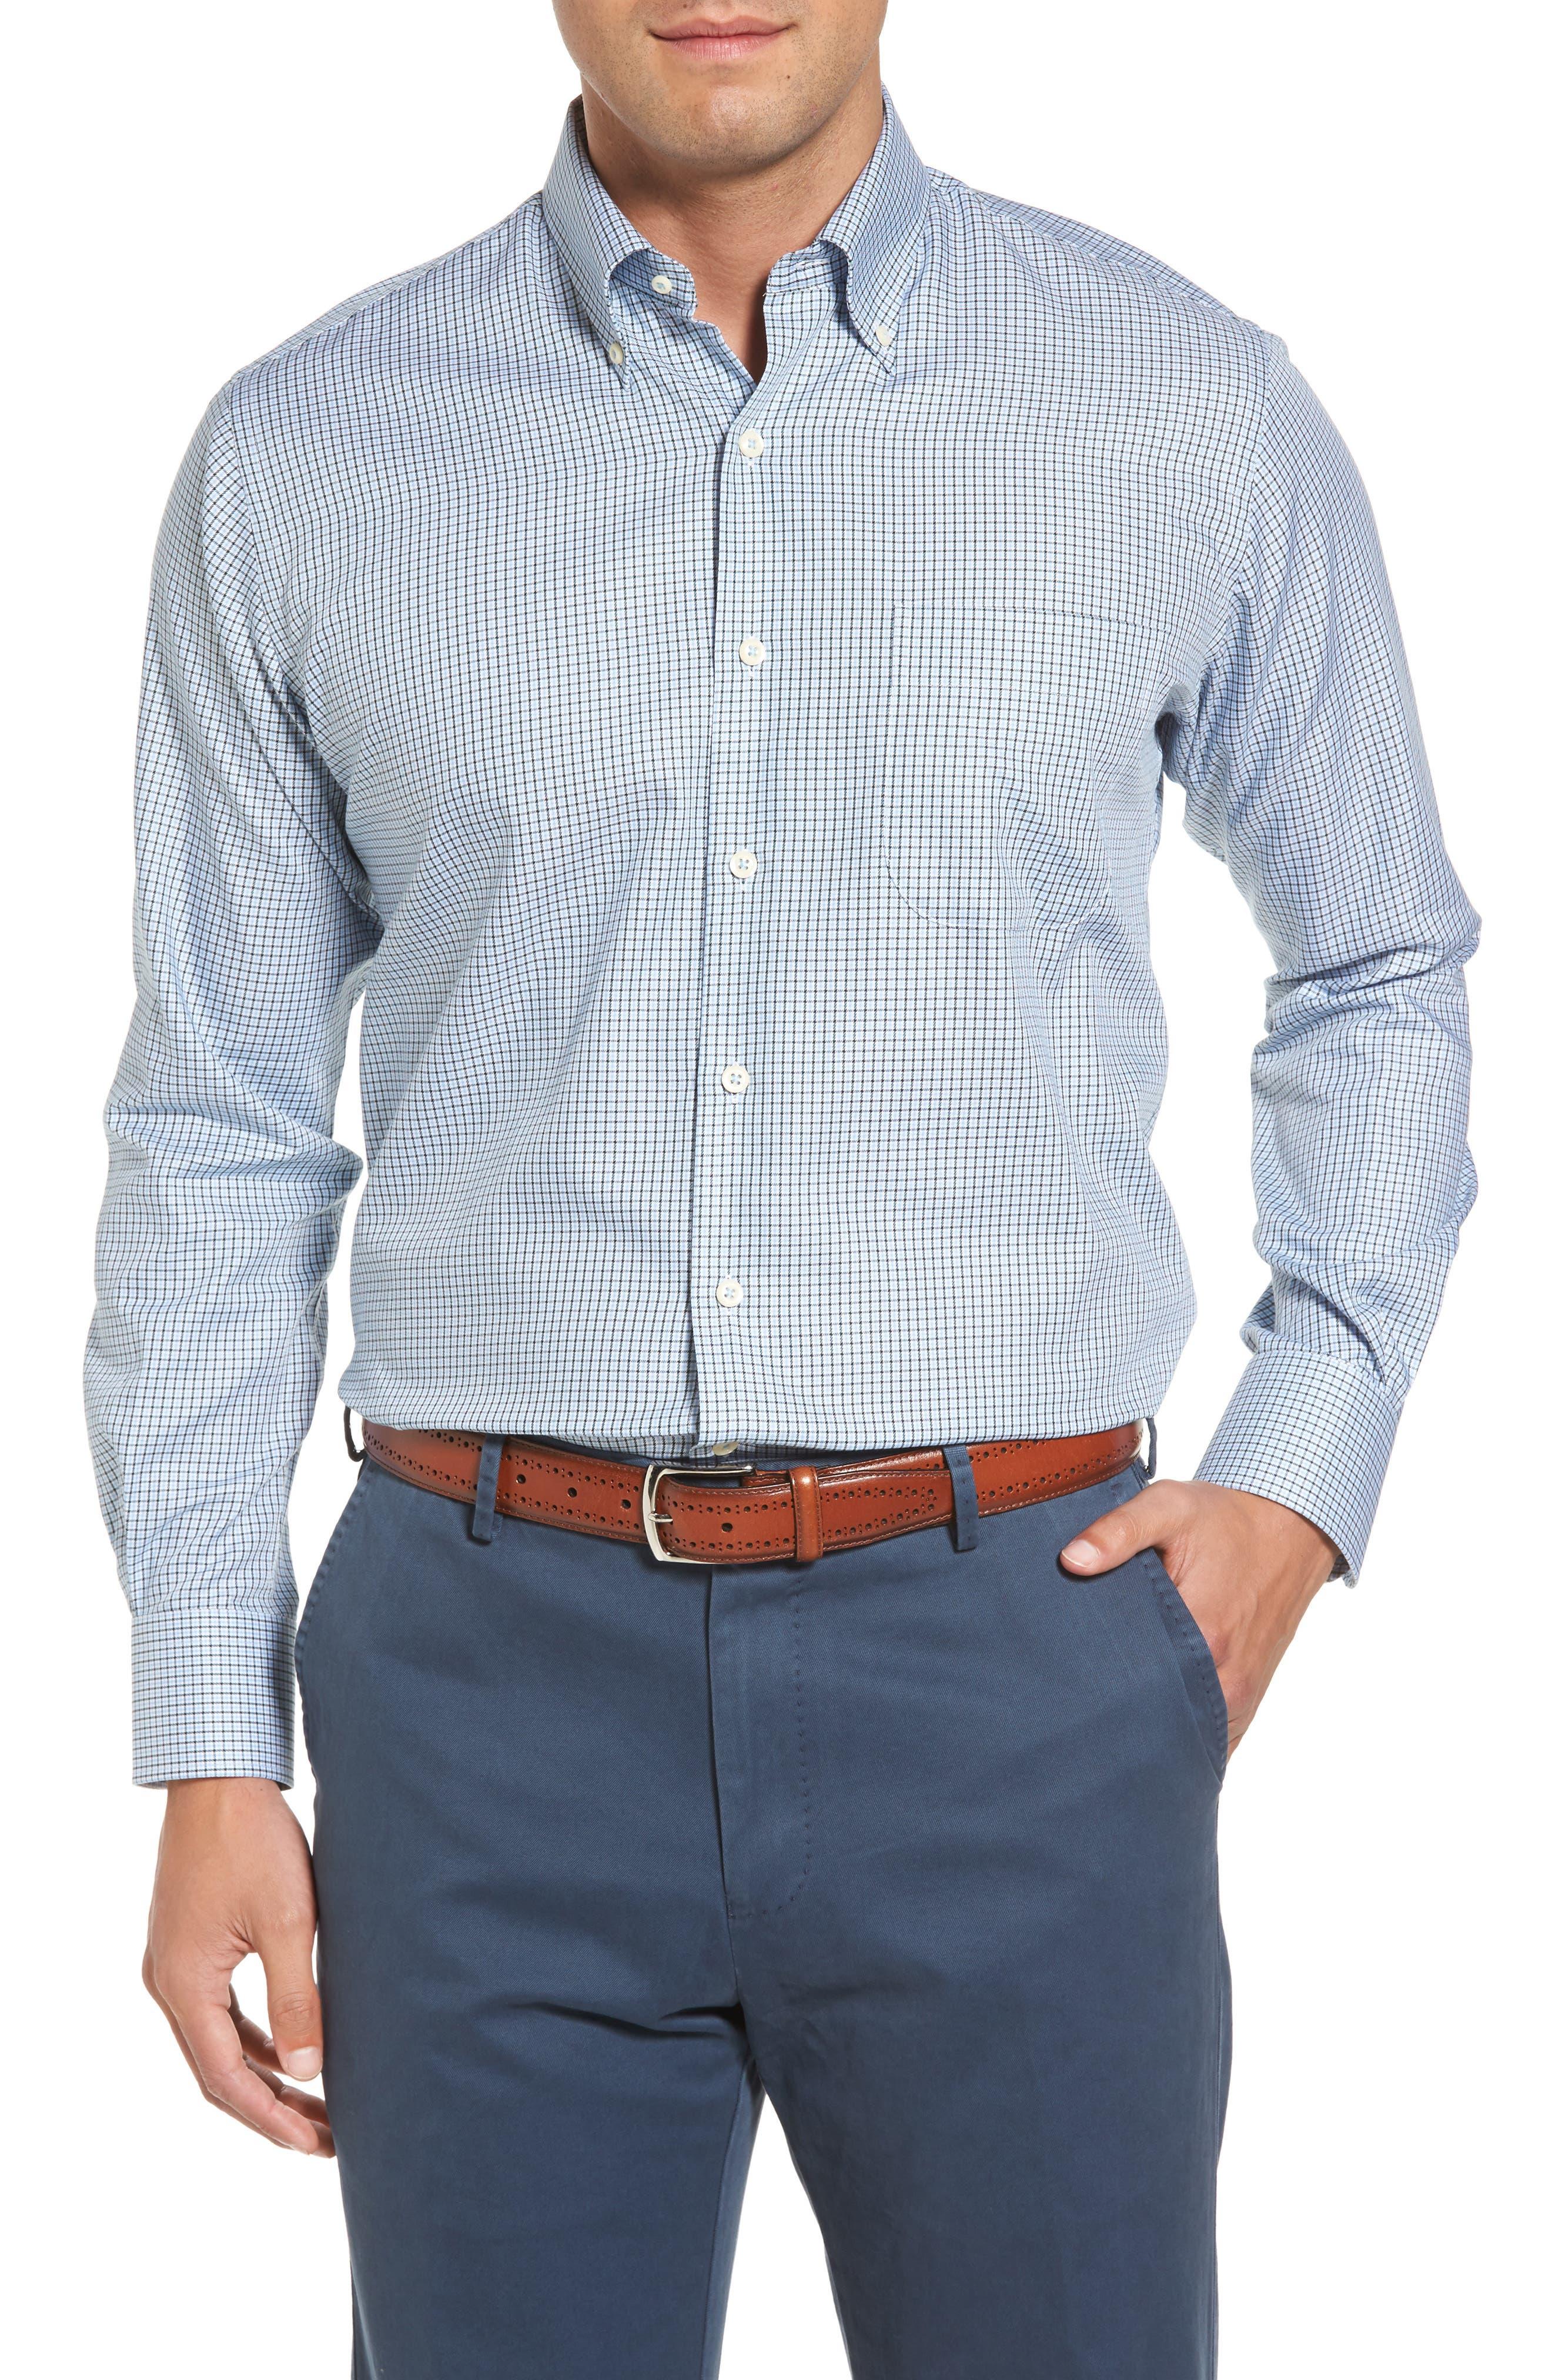 Elevation Regular Fit Check Sport Shirt,                             Main thumbnail 1, color,                             Tahoe Blue